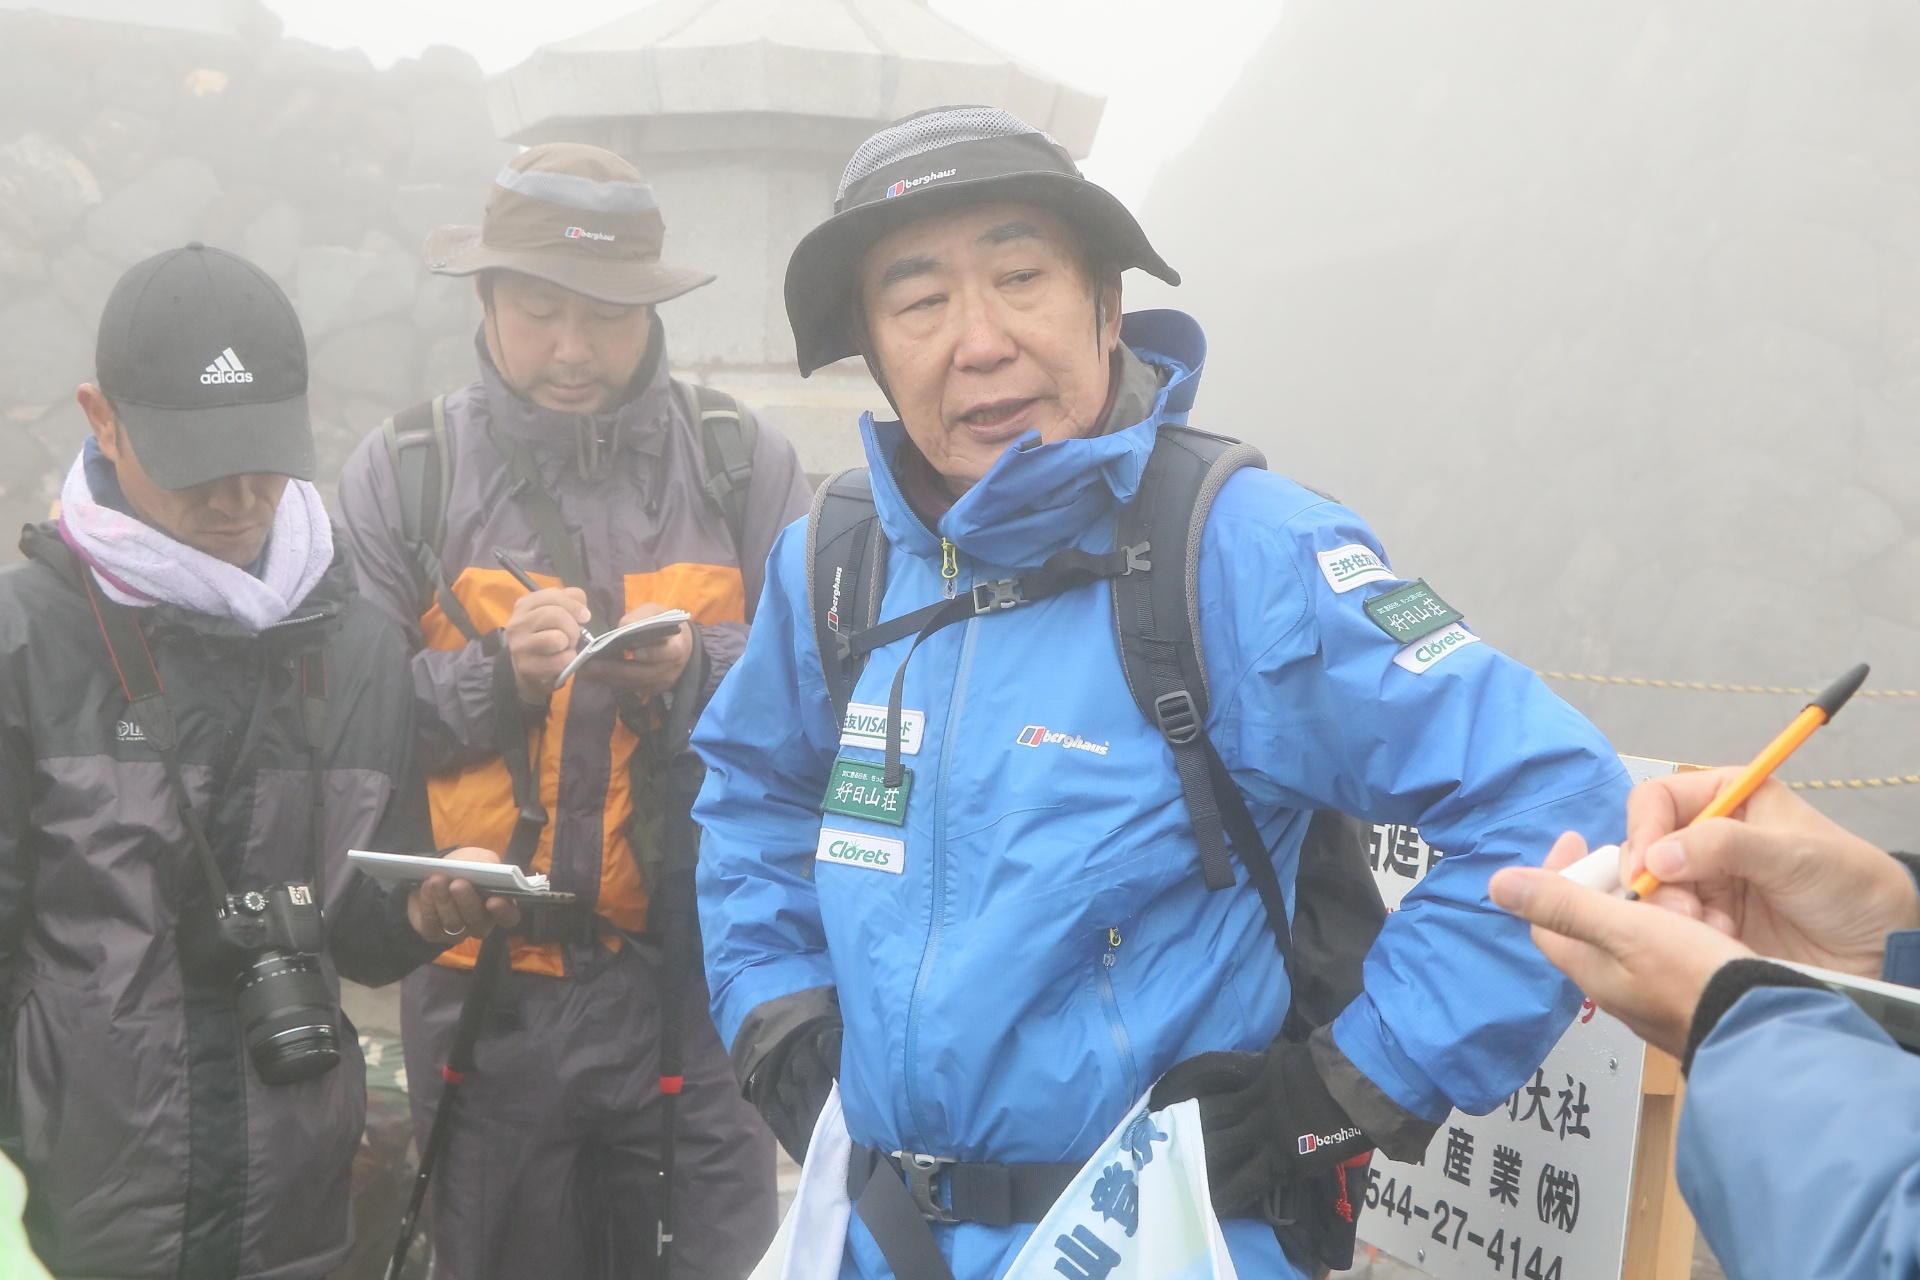 http://news.yoshimoto.co.jp/20170714101105-a7afa51d6f3dab0cb35ea8ae267db5b96ba6692c.jpg